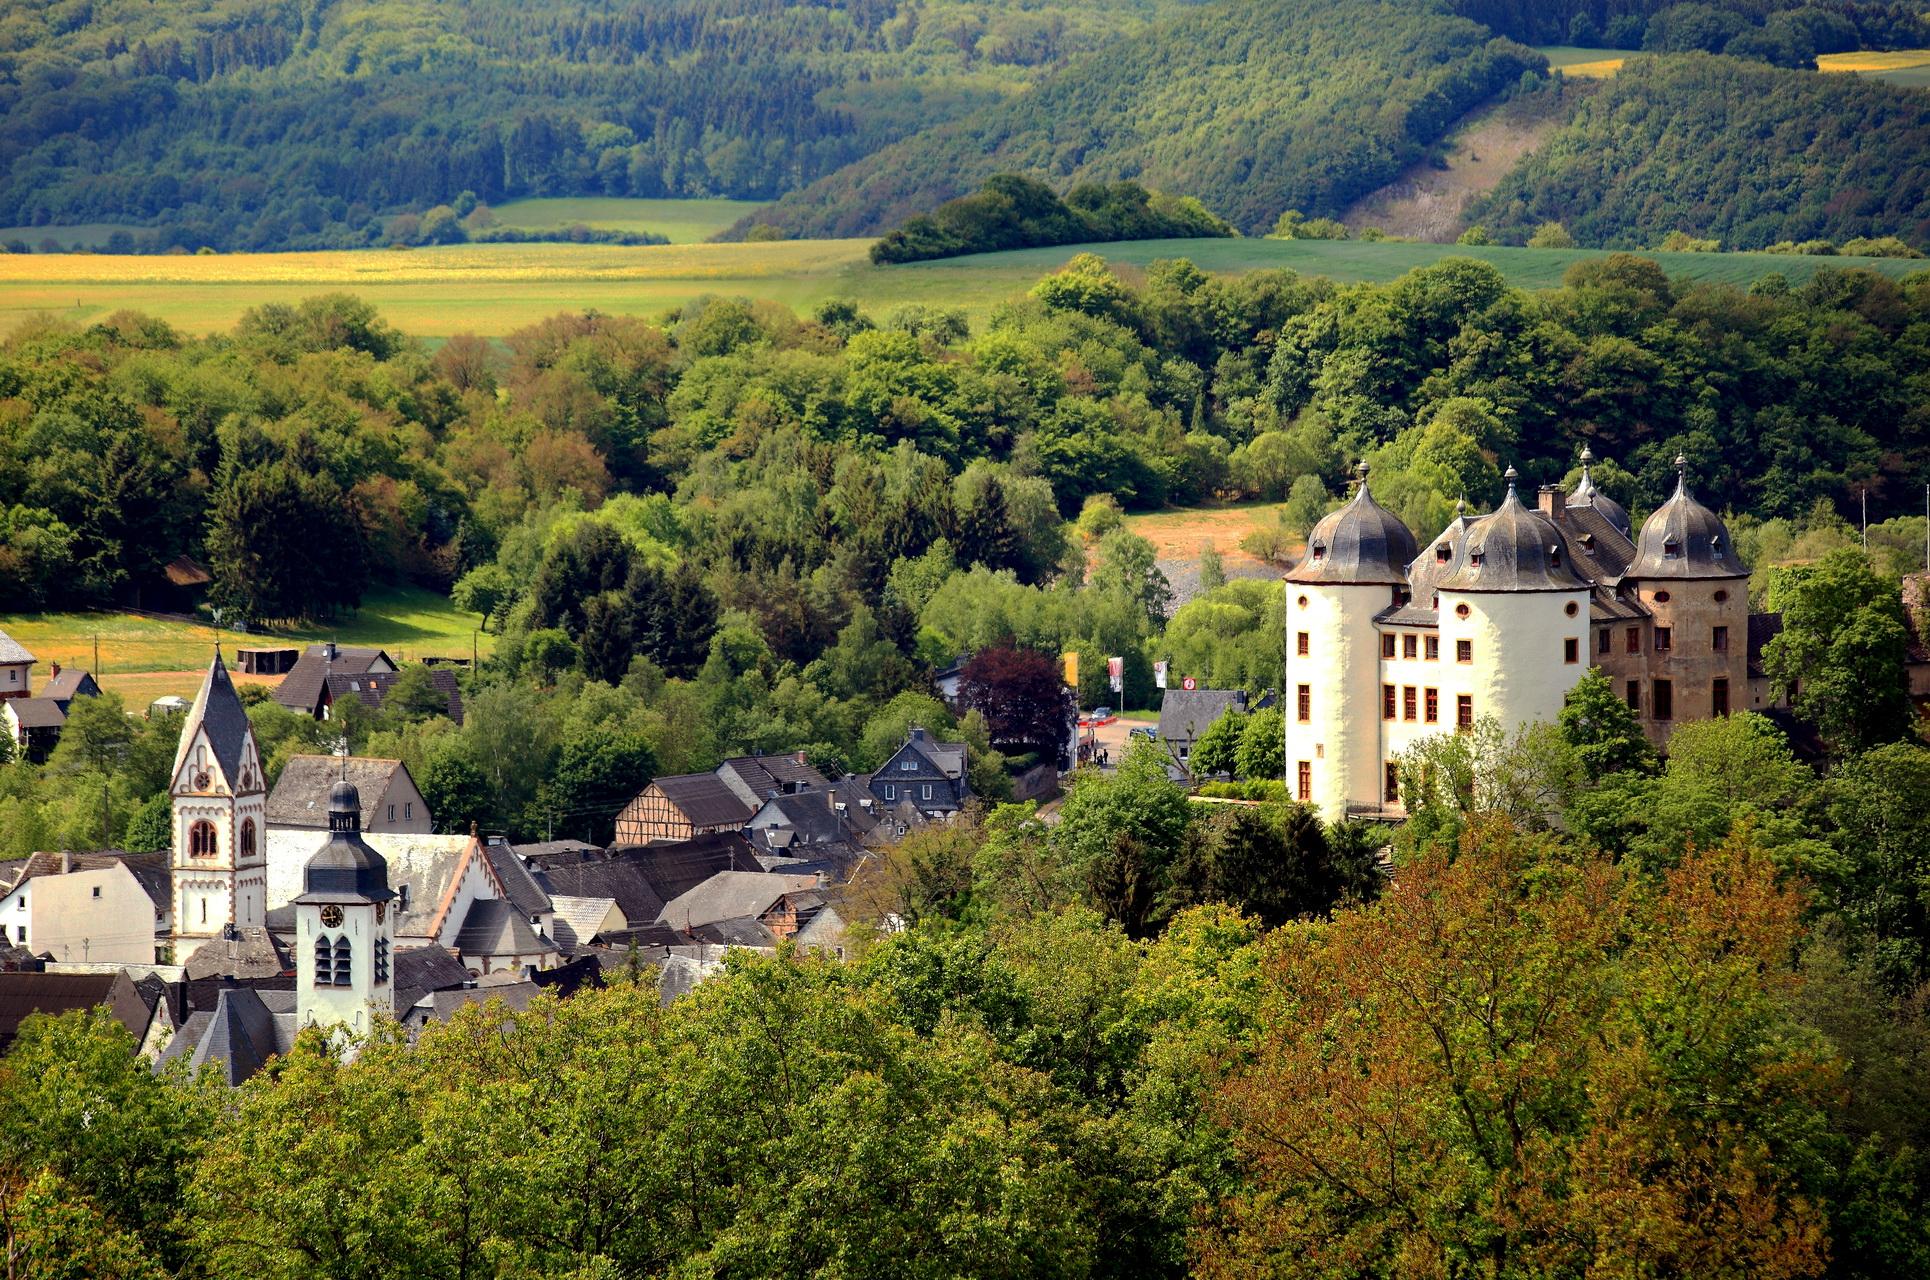 Neowise Rheinland Pfalz